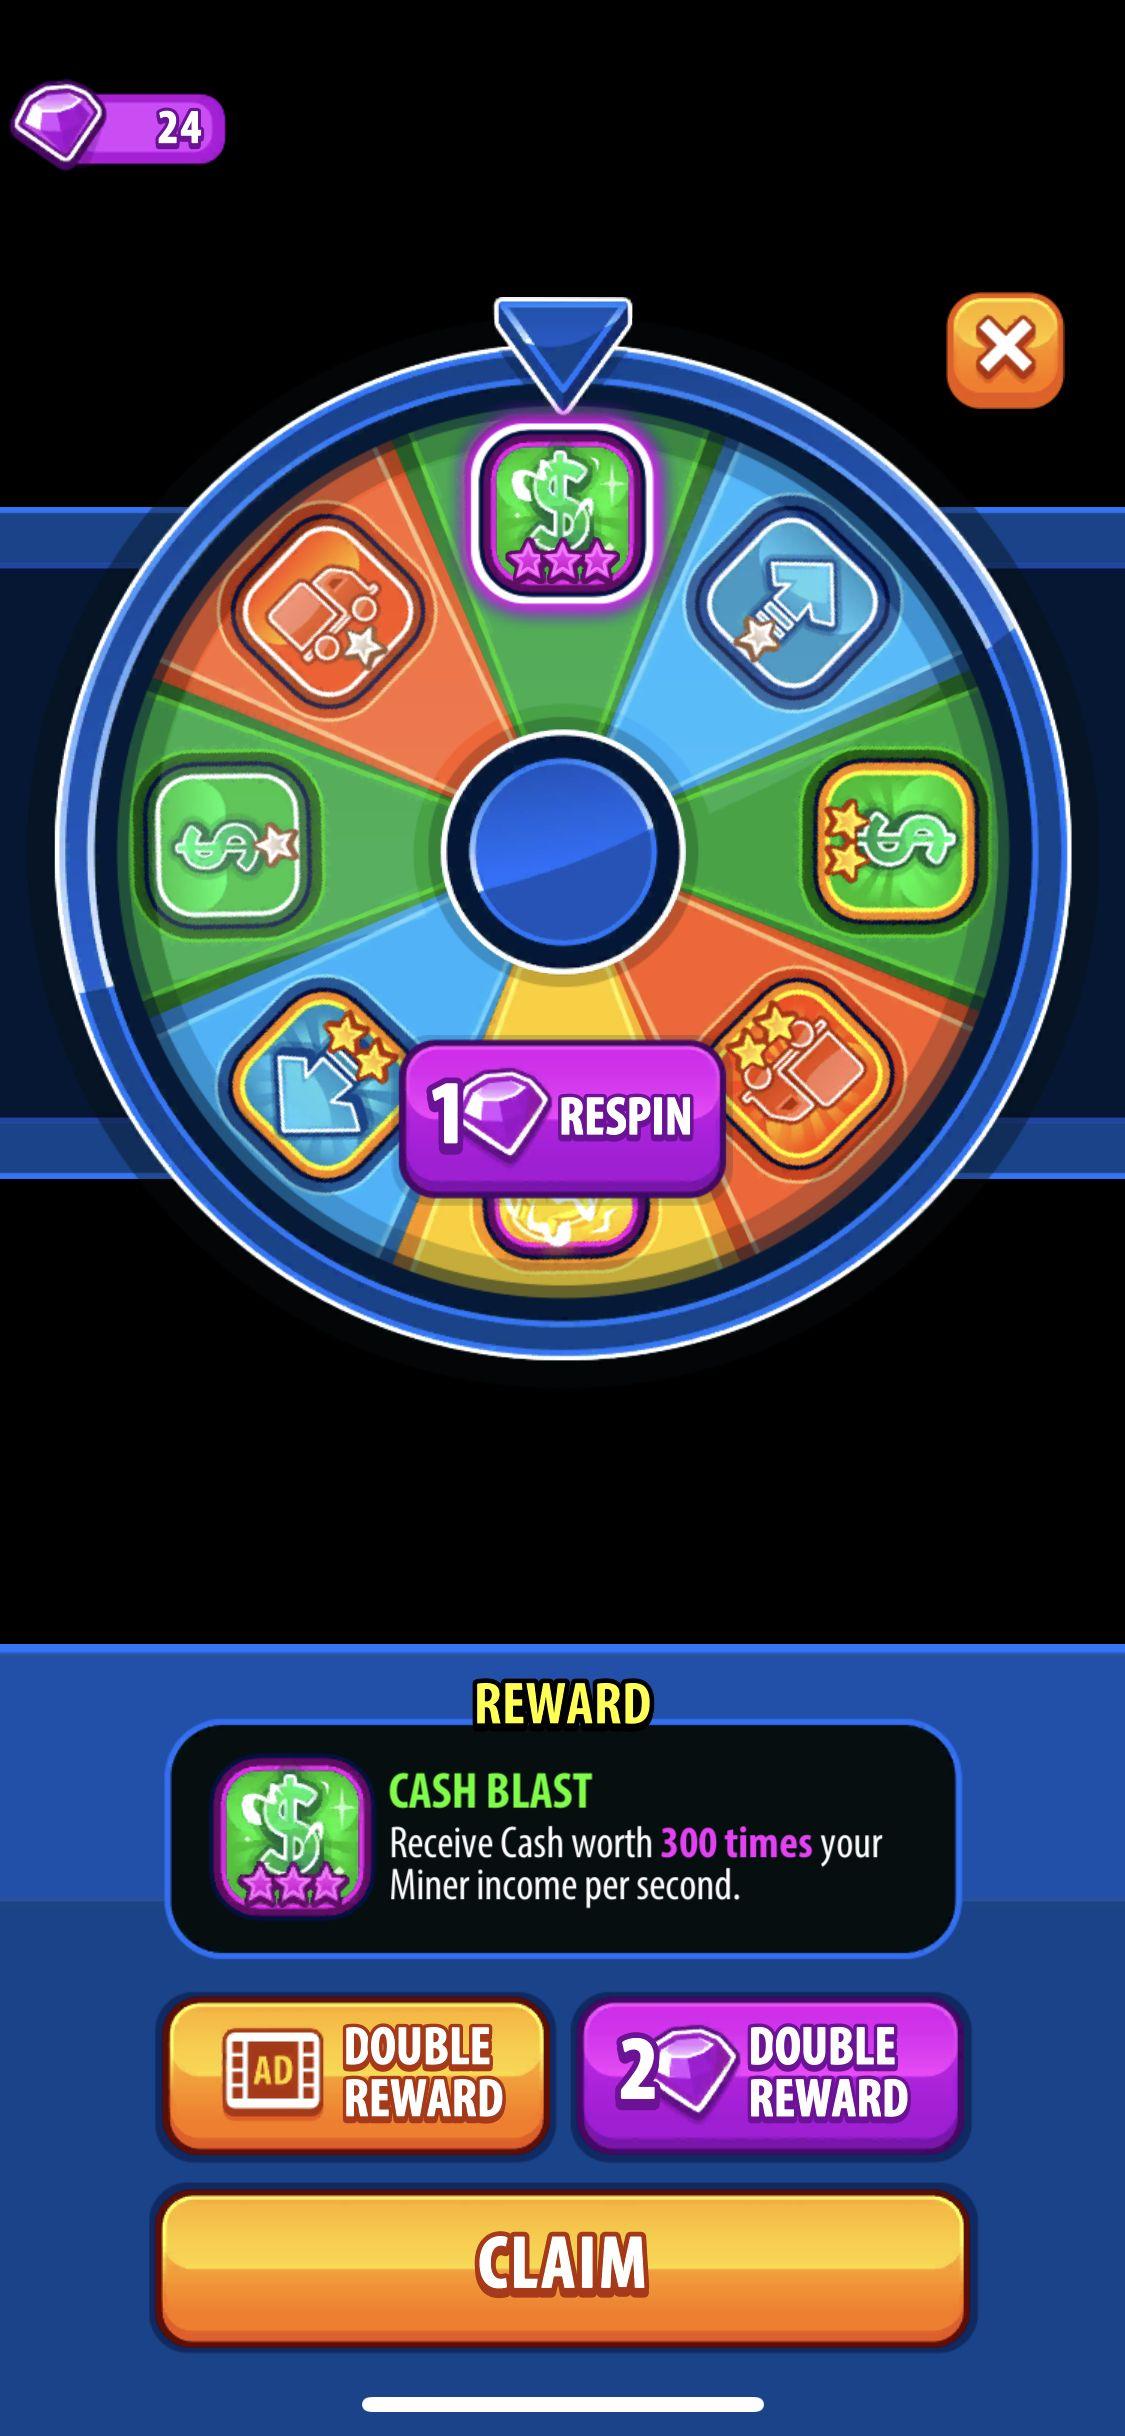 Ghim của GAME DESIGN trên Wheel of Fortune